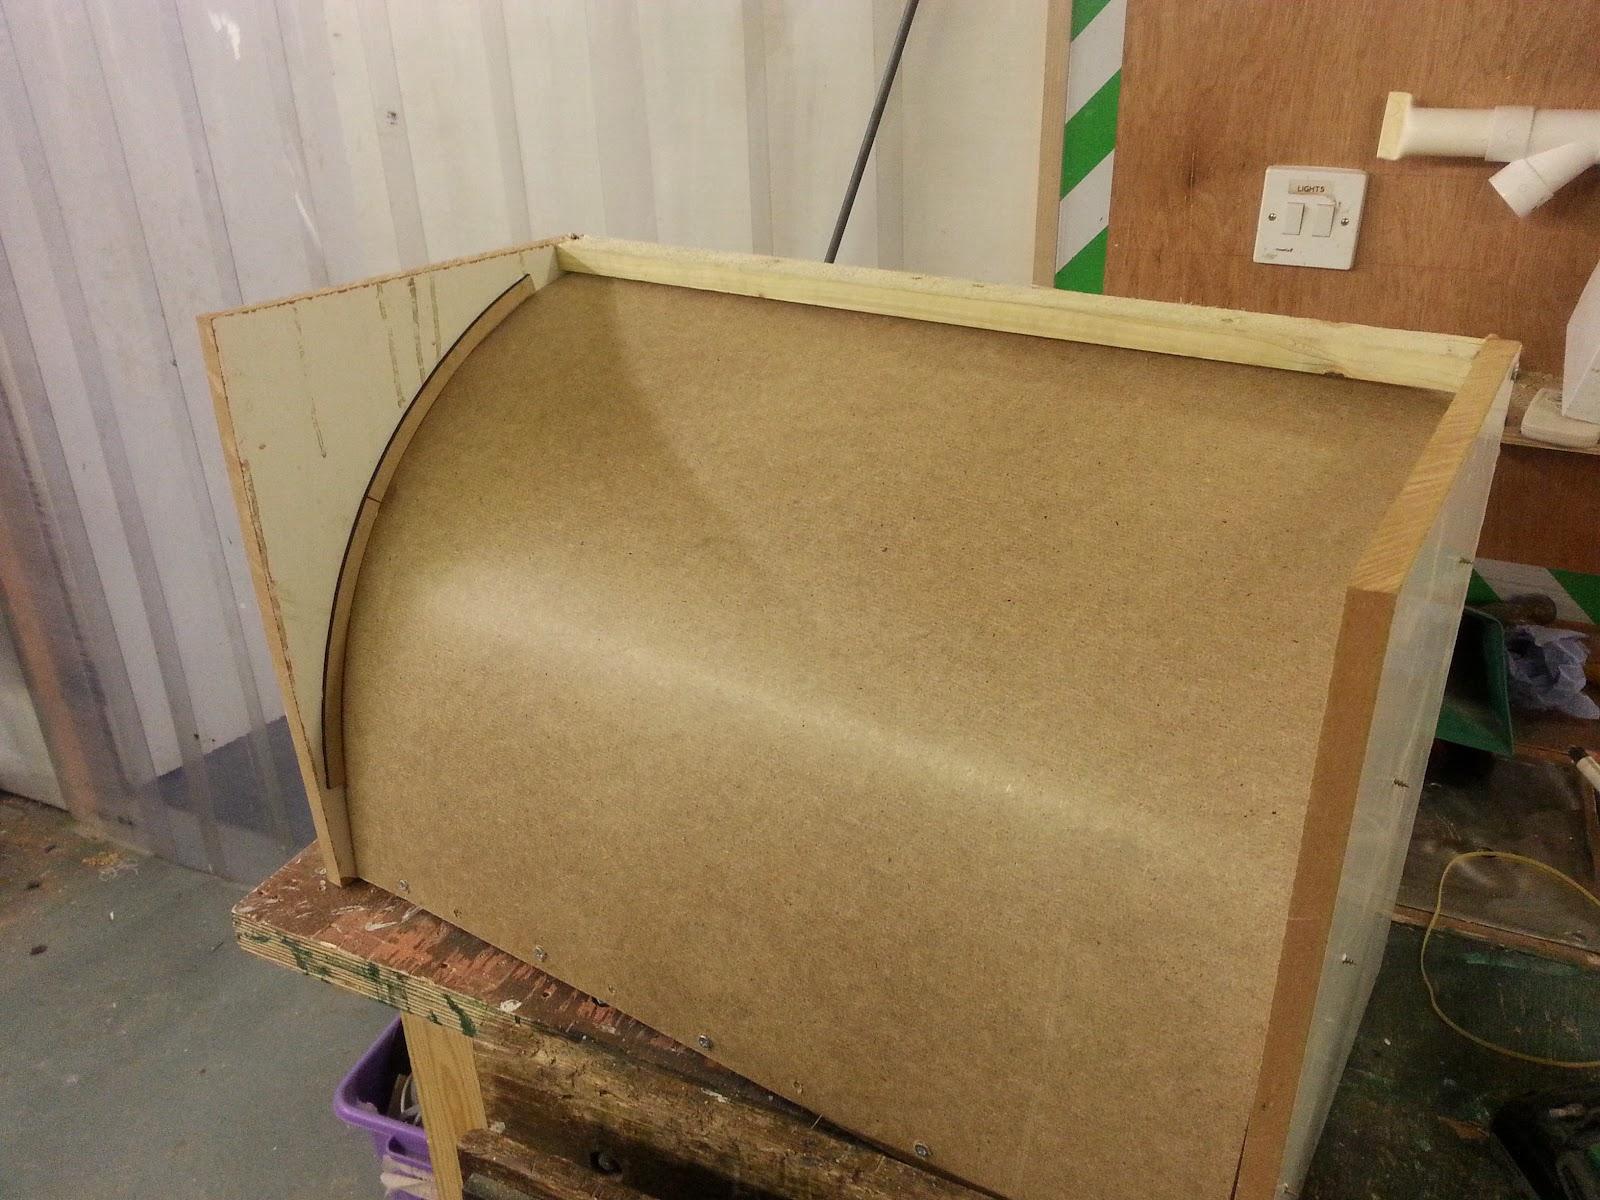 Nerd Club Making A Curved Acrylic Fingerboard